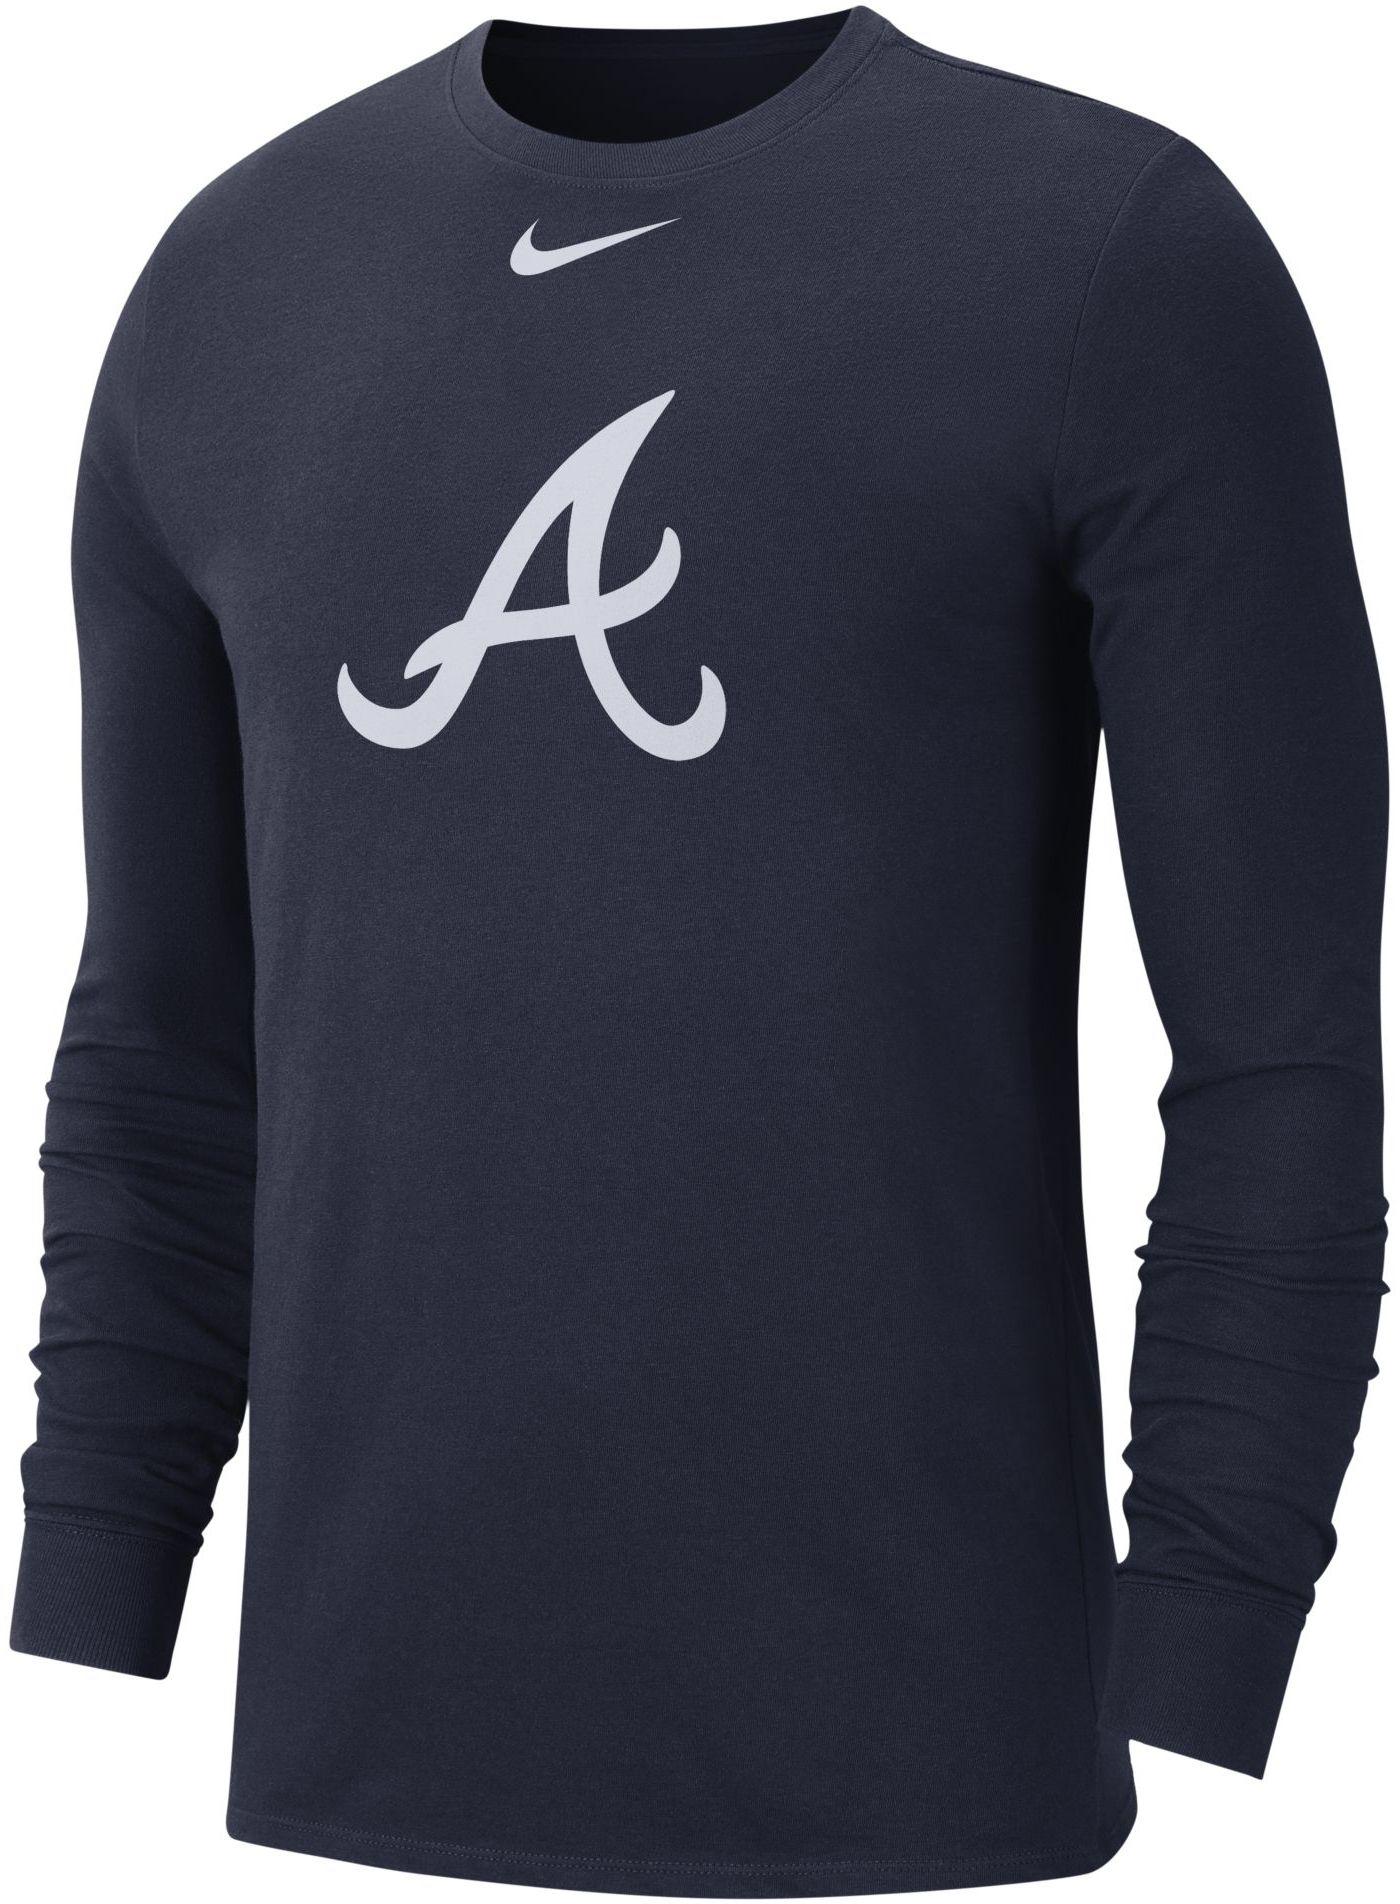 Nike Men's Atlanta Braves Dri-FIT Long Sleeve Shirt